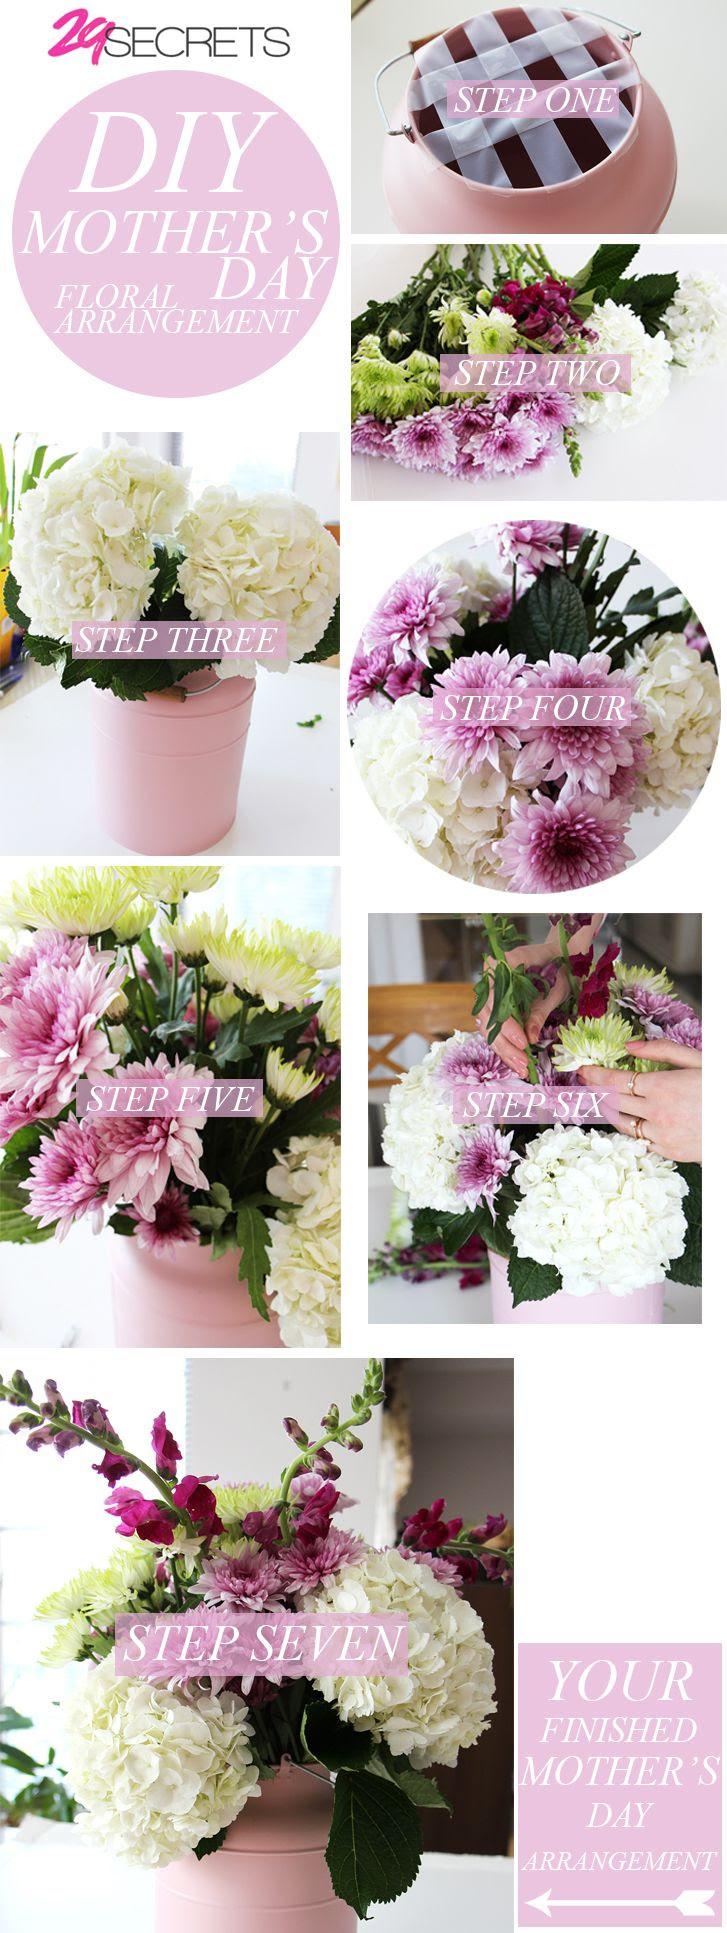 Diy Mother S Day Floral Arrangement 29secrets